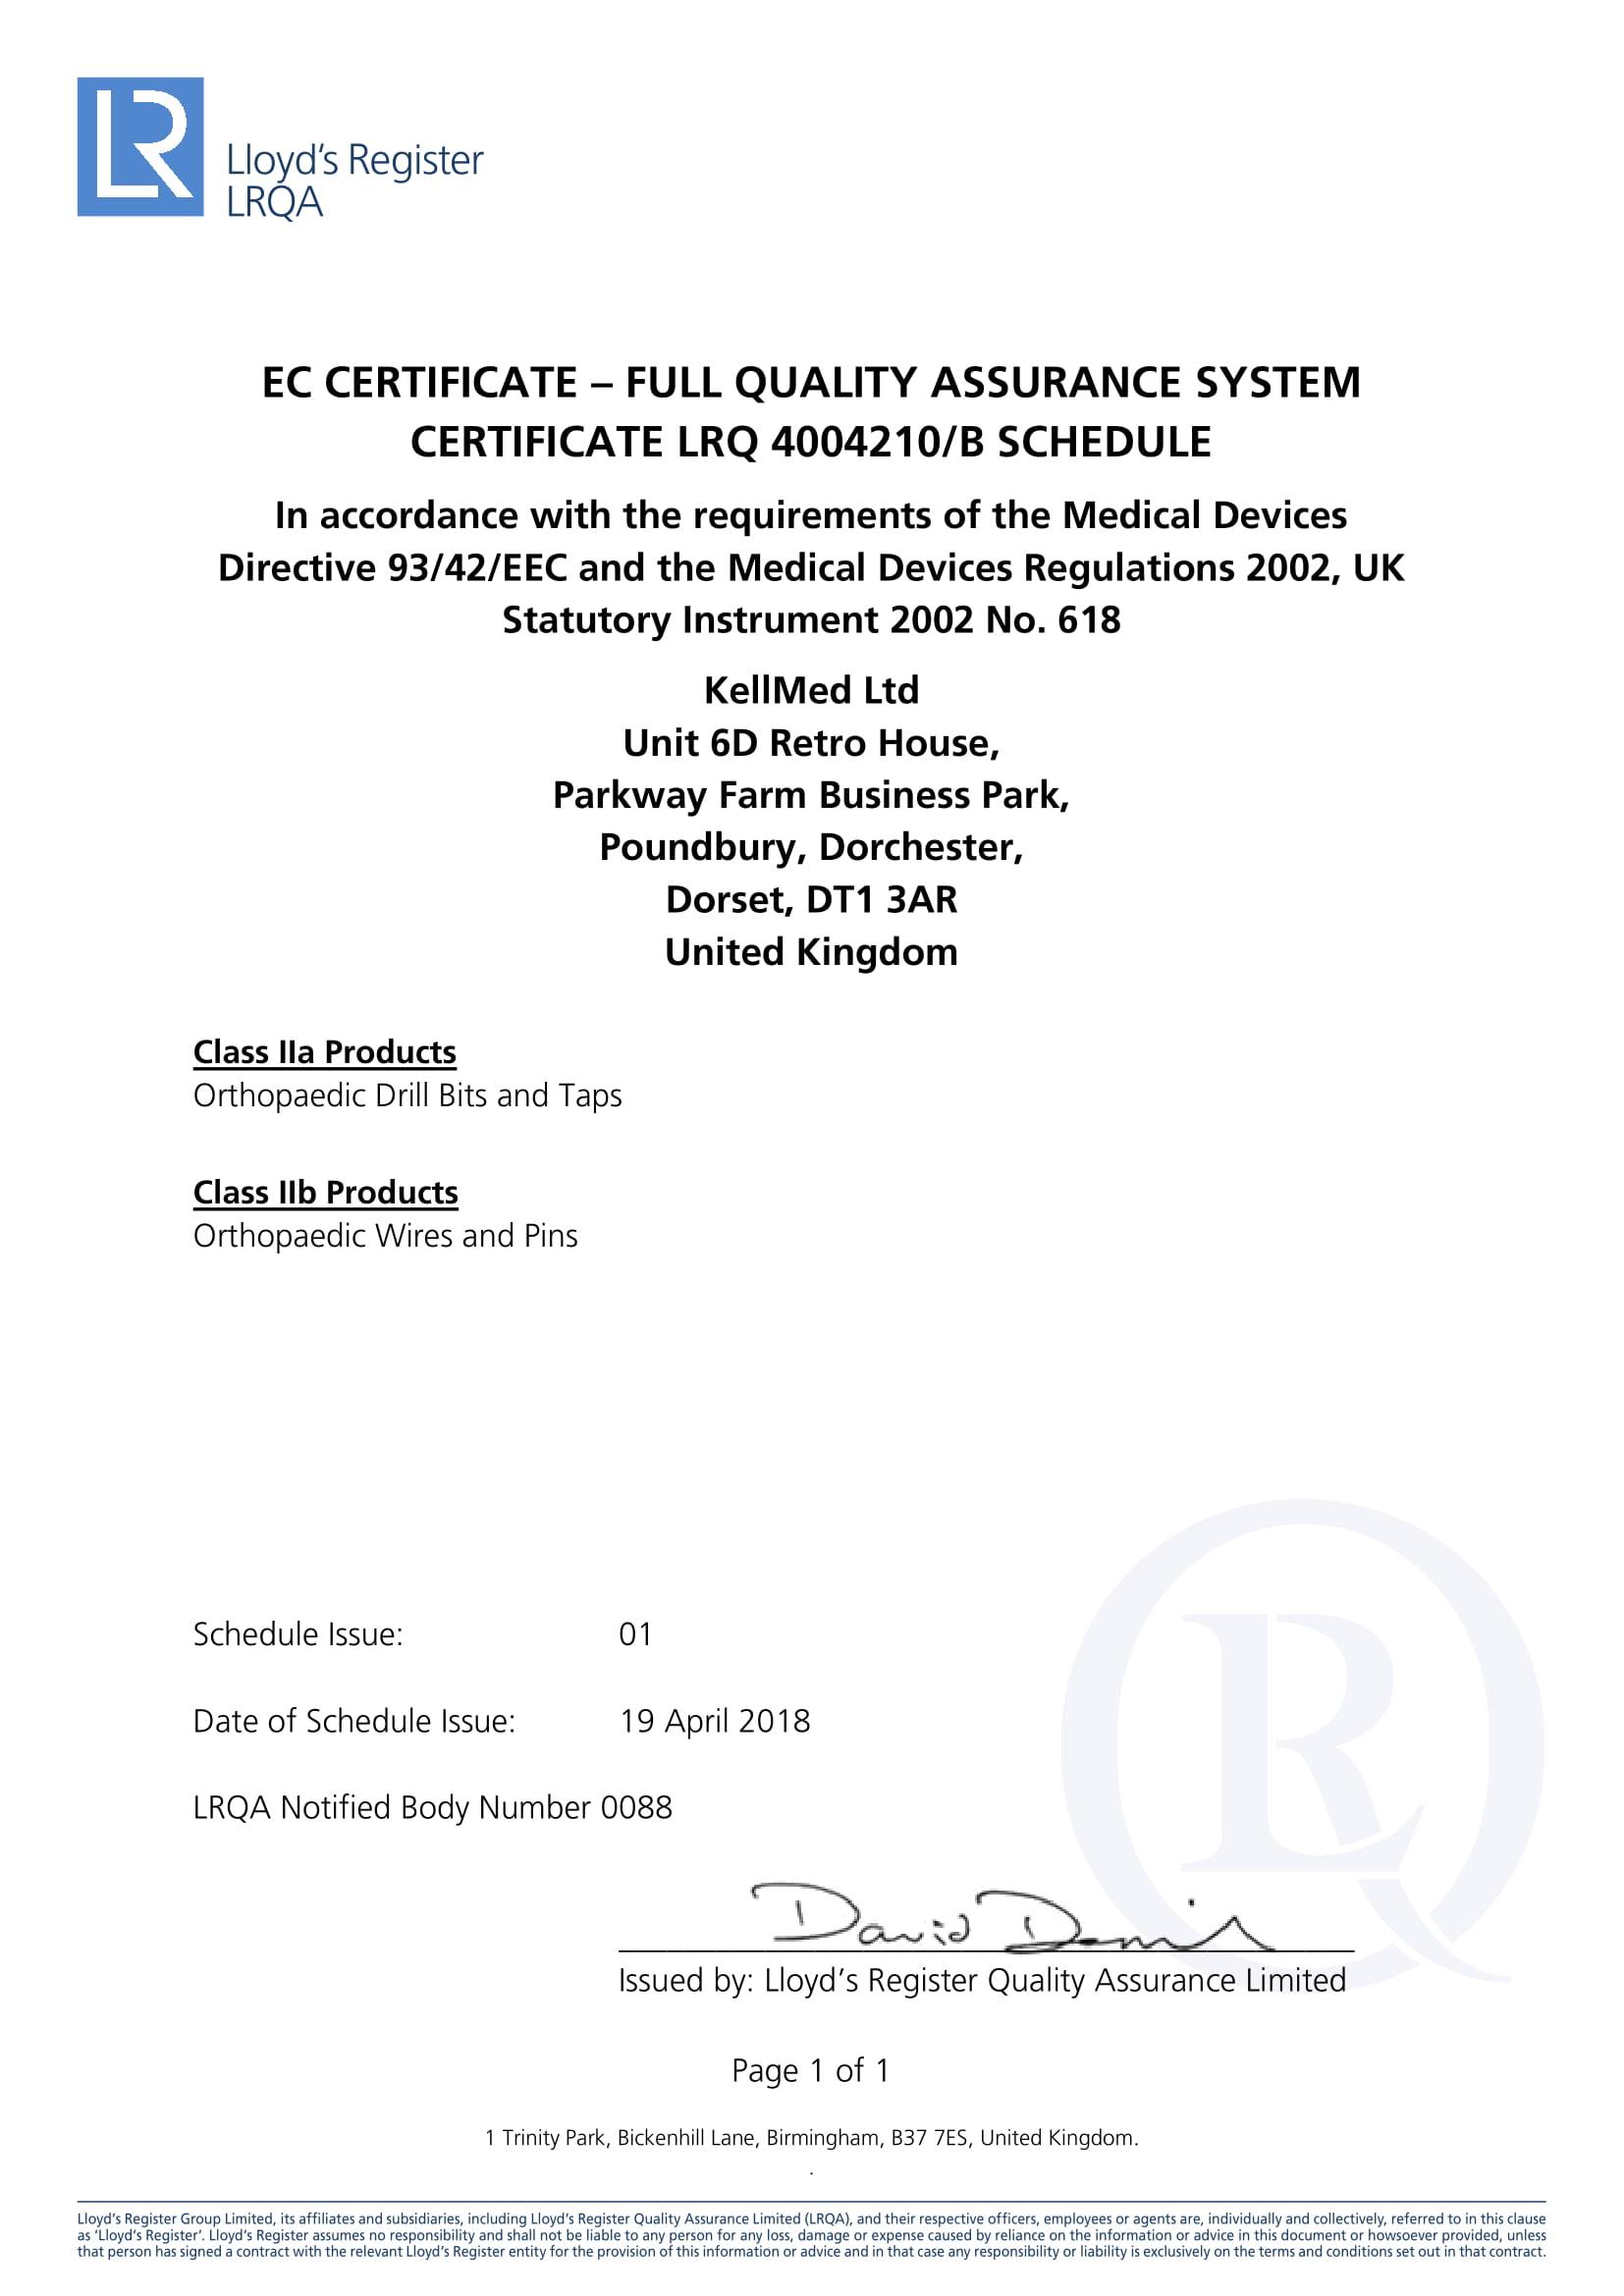 Quality Assurance Certification Kellmed Ltd